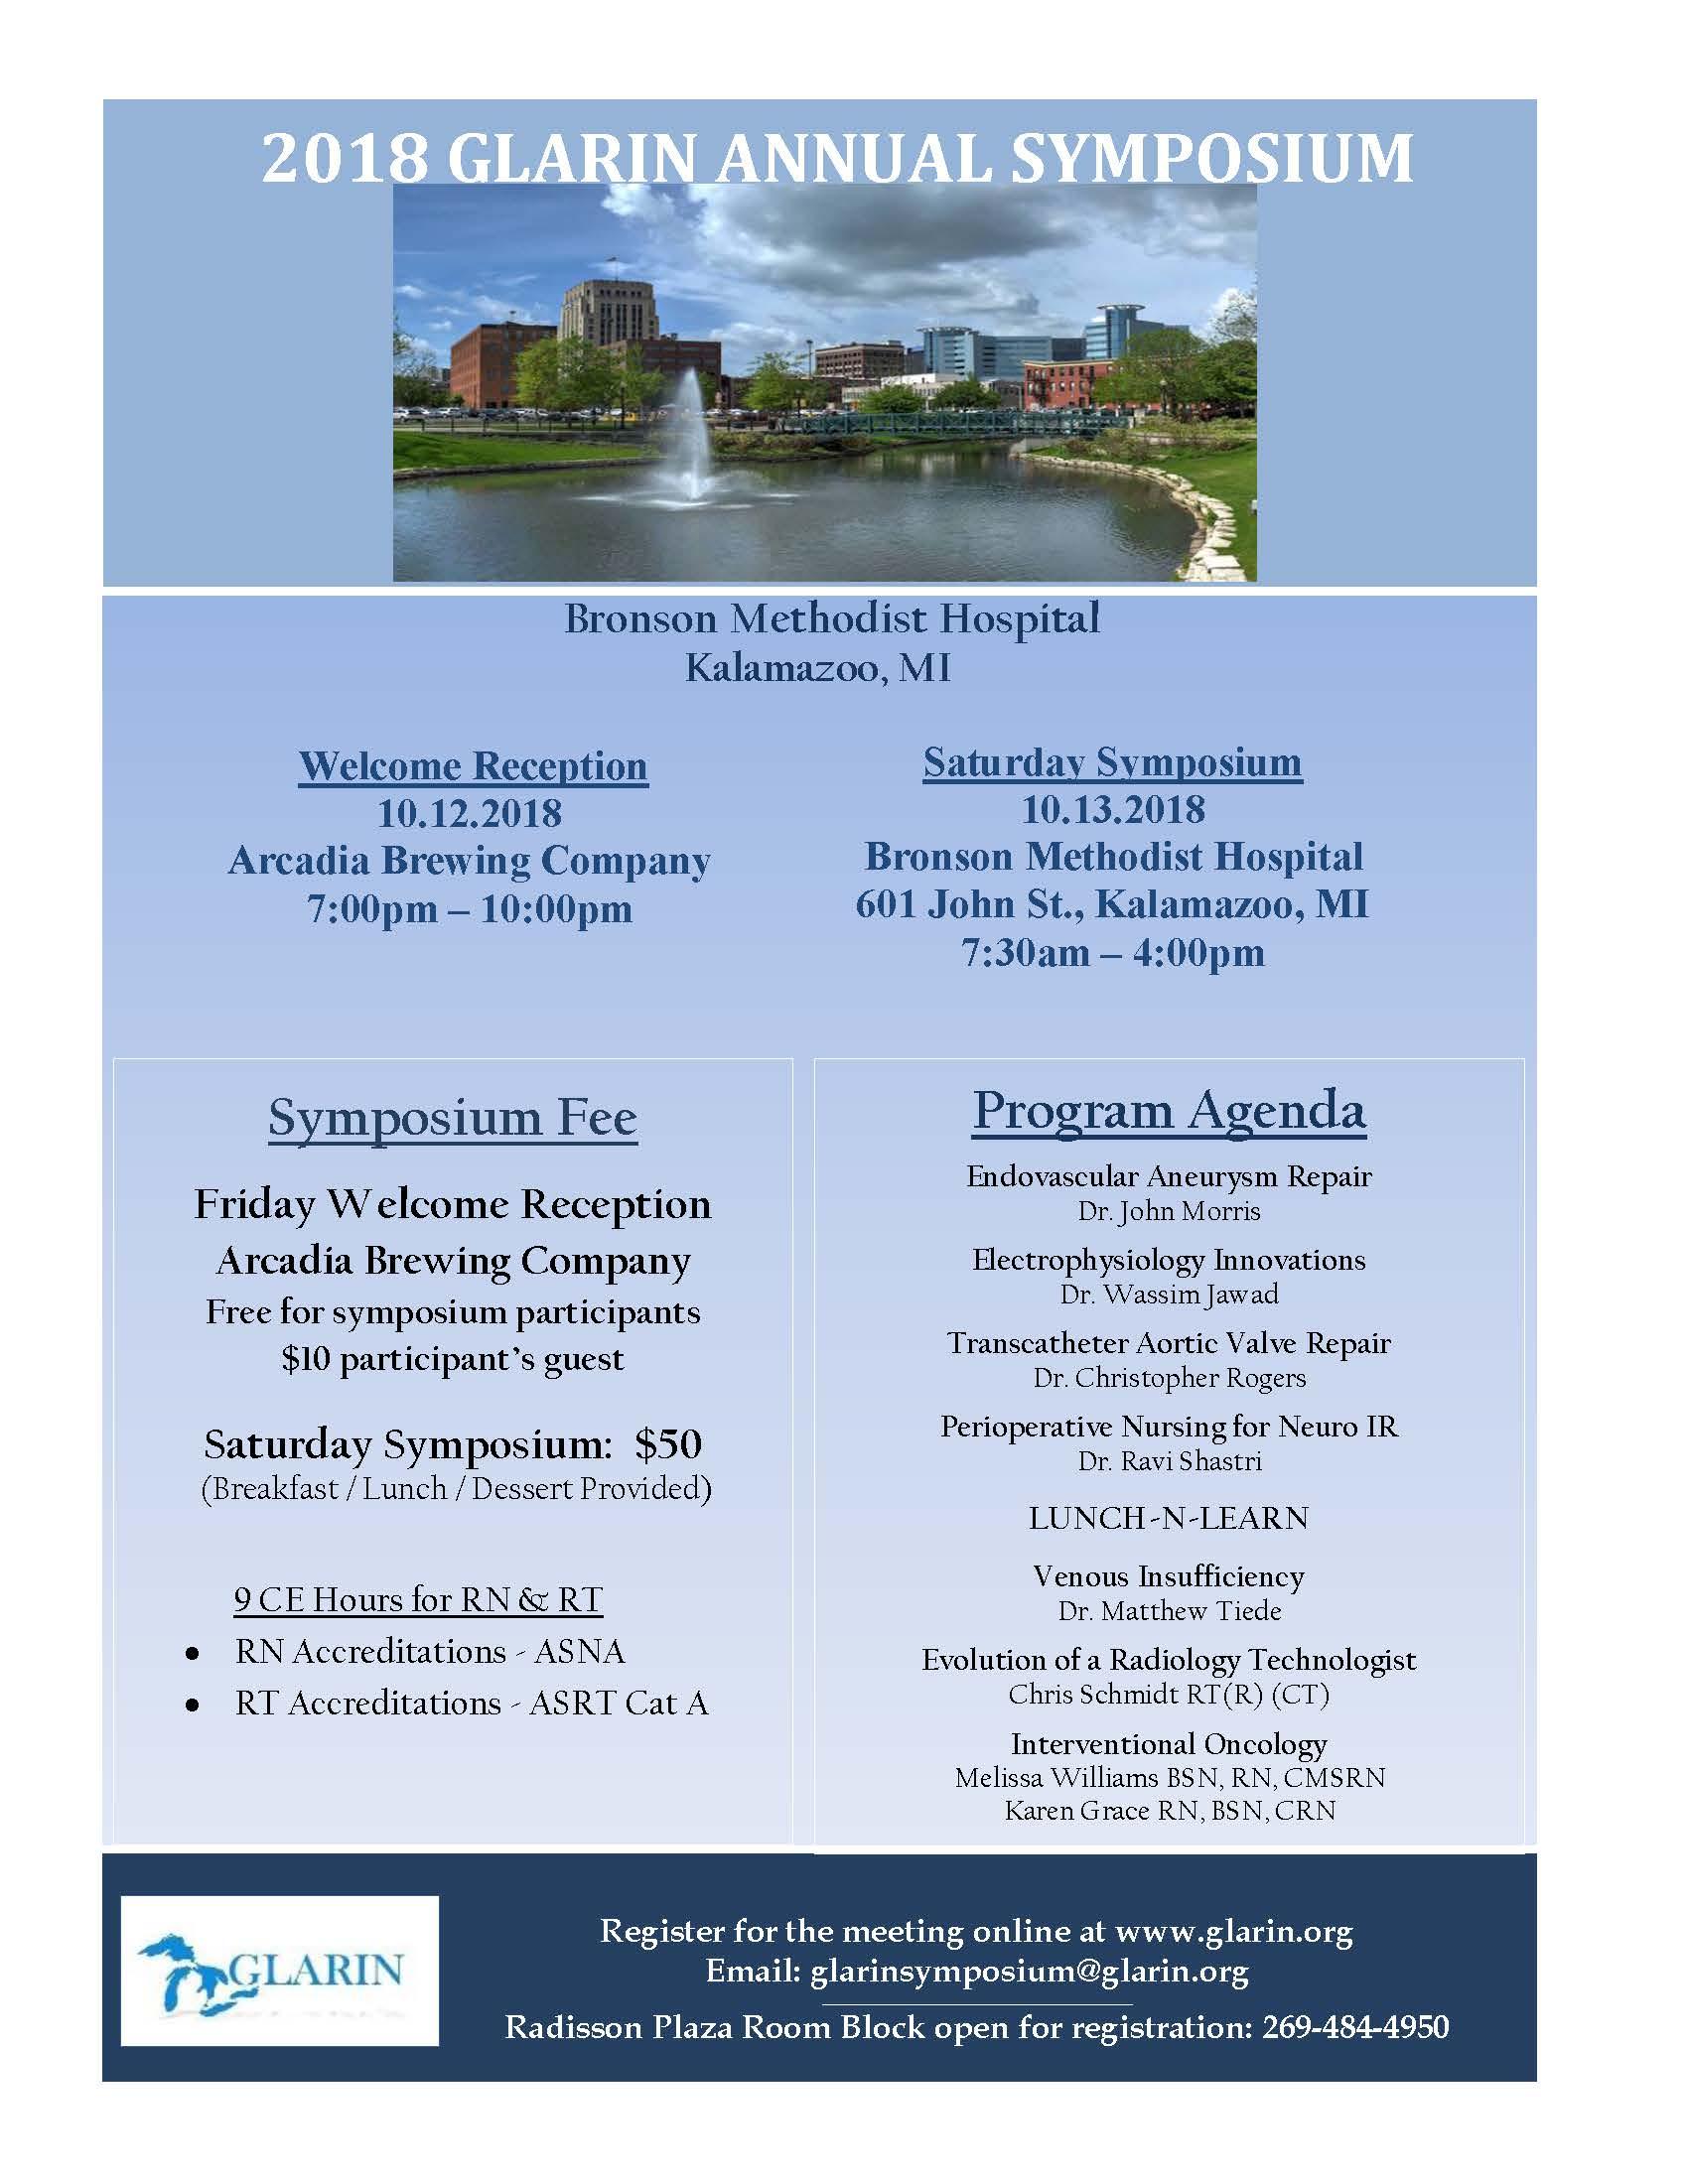 2018 GLARIN Annual Symposium - The Association for Radiologic